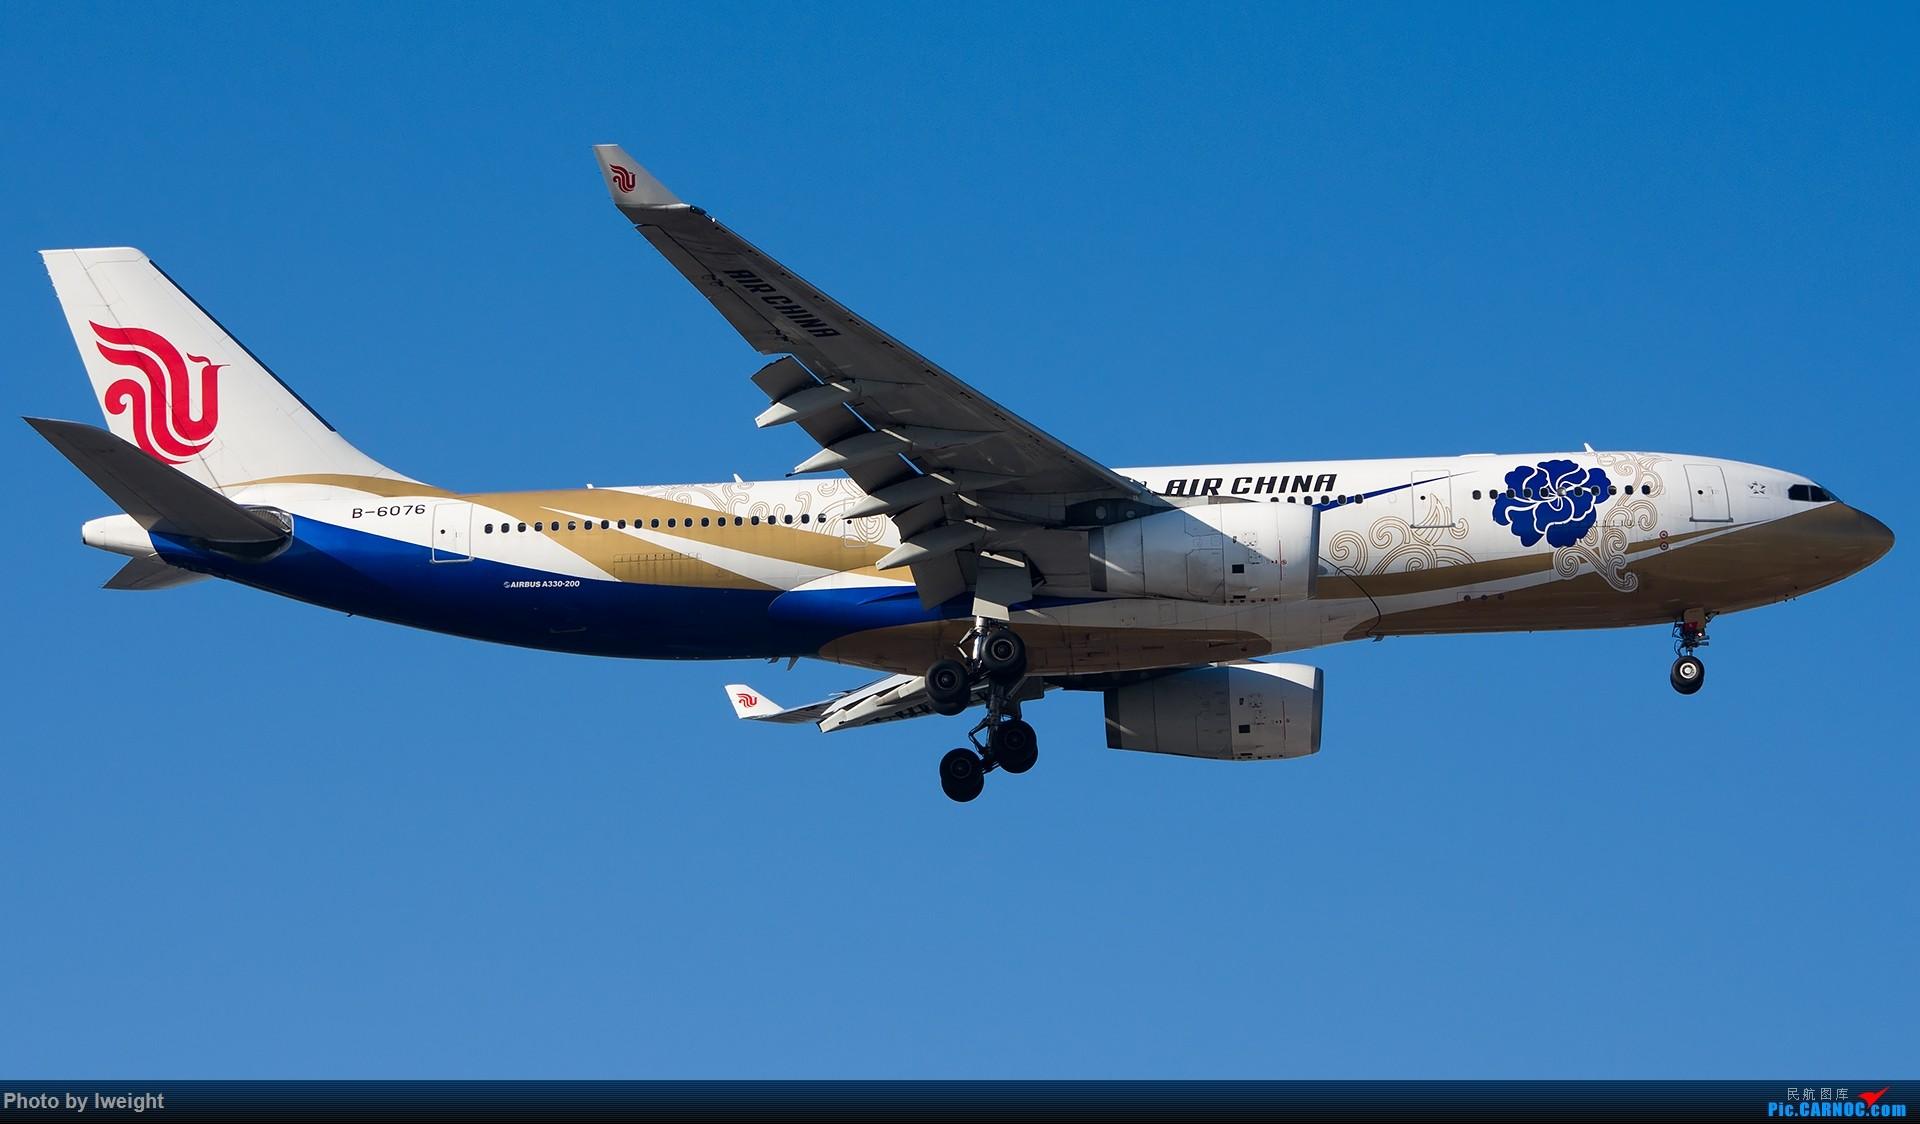 Re:[原创]终于在12月的北京等到了一个晴天的周末,出来拍拍飞机【2015-12-5】 AIRBUS A330-200 B-6076 中国北京首都国际机场